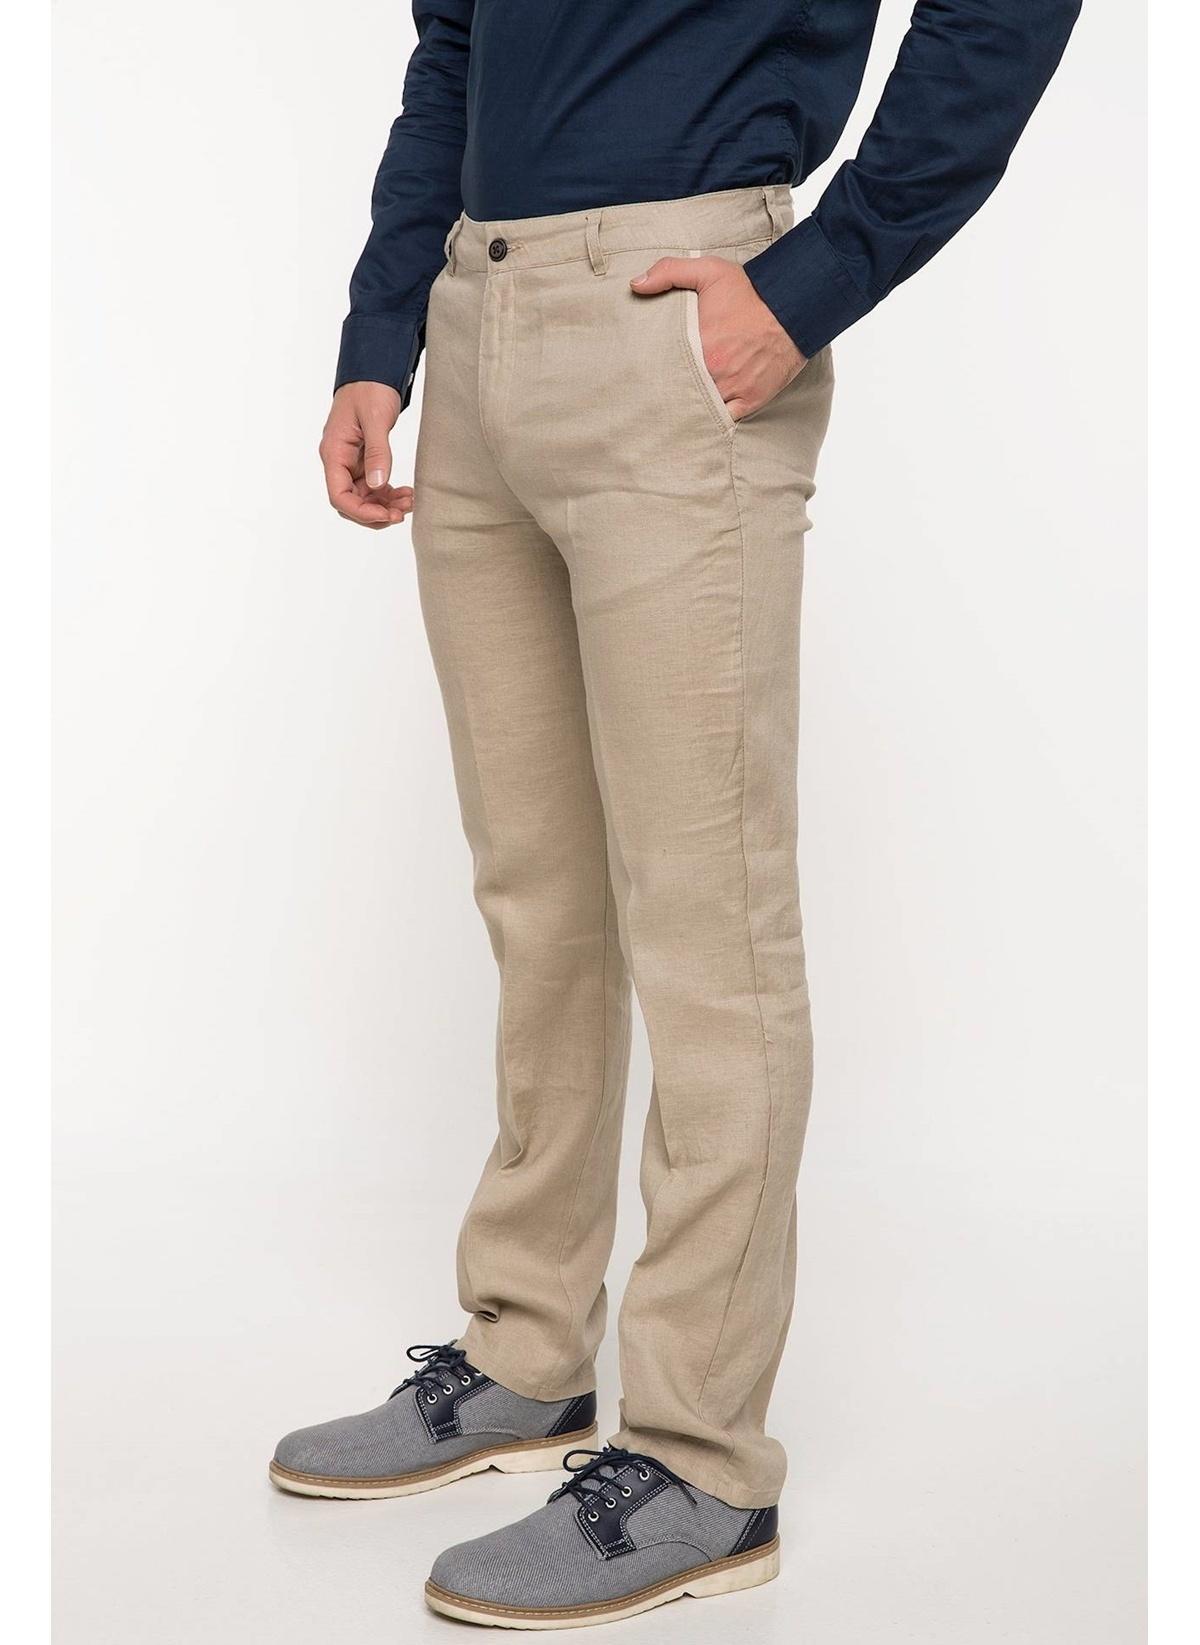 Defacto Oscar Keten Chino Pantolon G8339az18smbg193 Pantolon – 99.99 TL